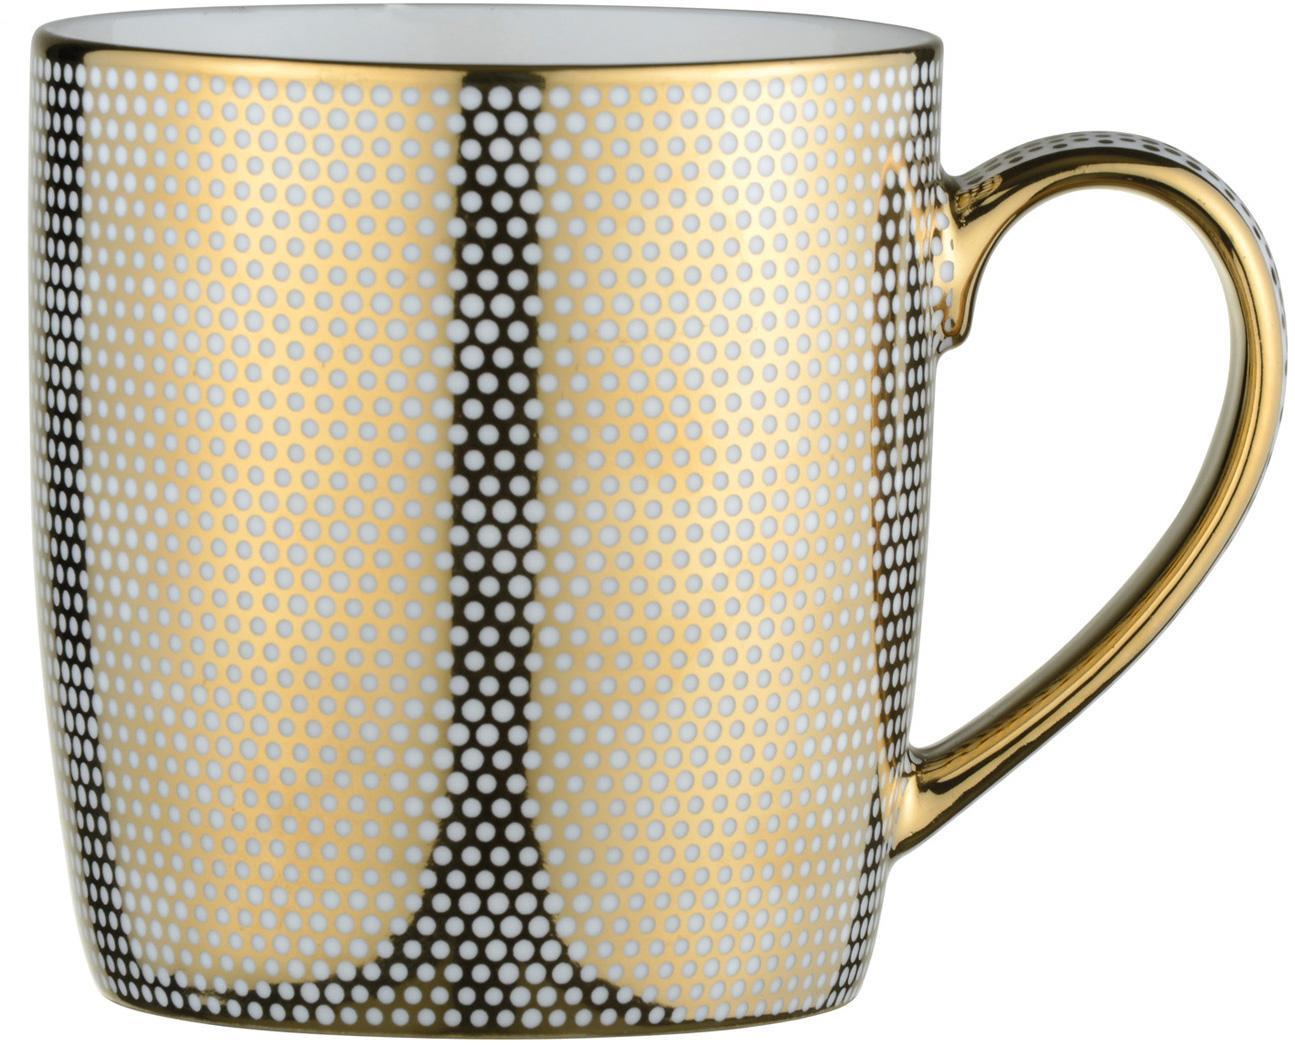 Tazas Dots, 4uds., Porcelana, Blanco, dorado, Ø 9 x Al 10 cm